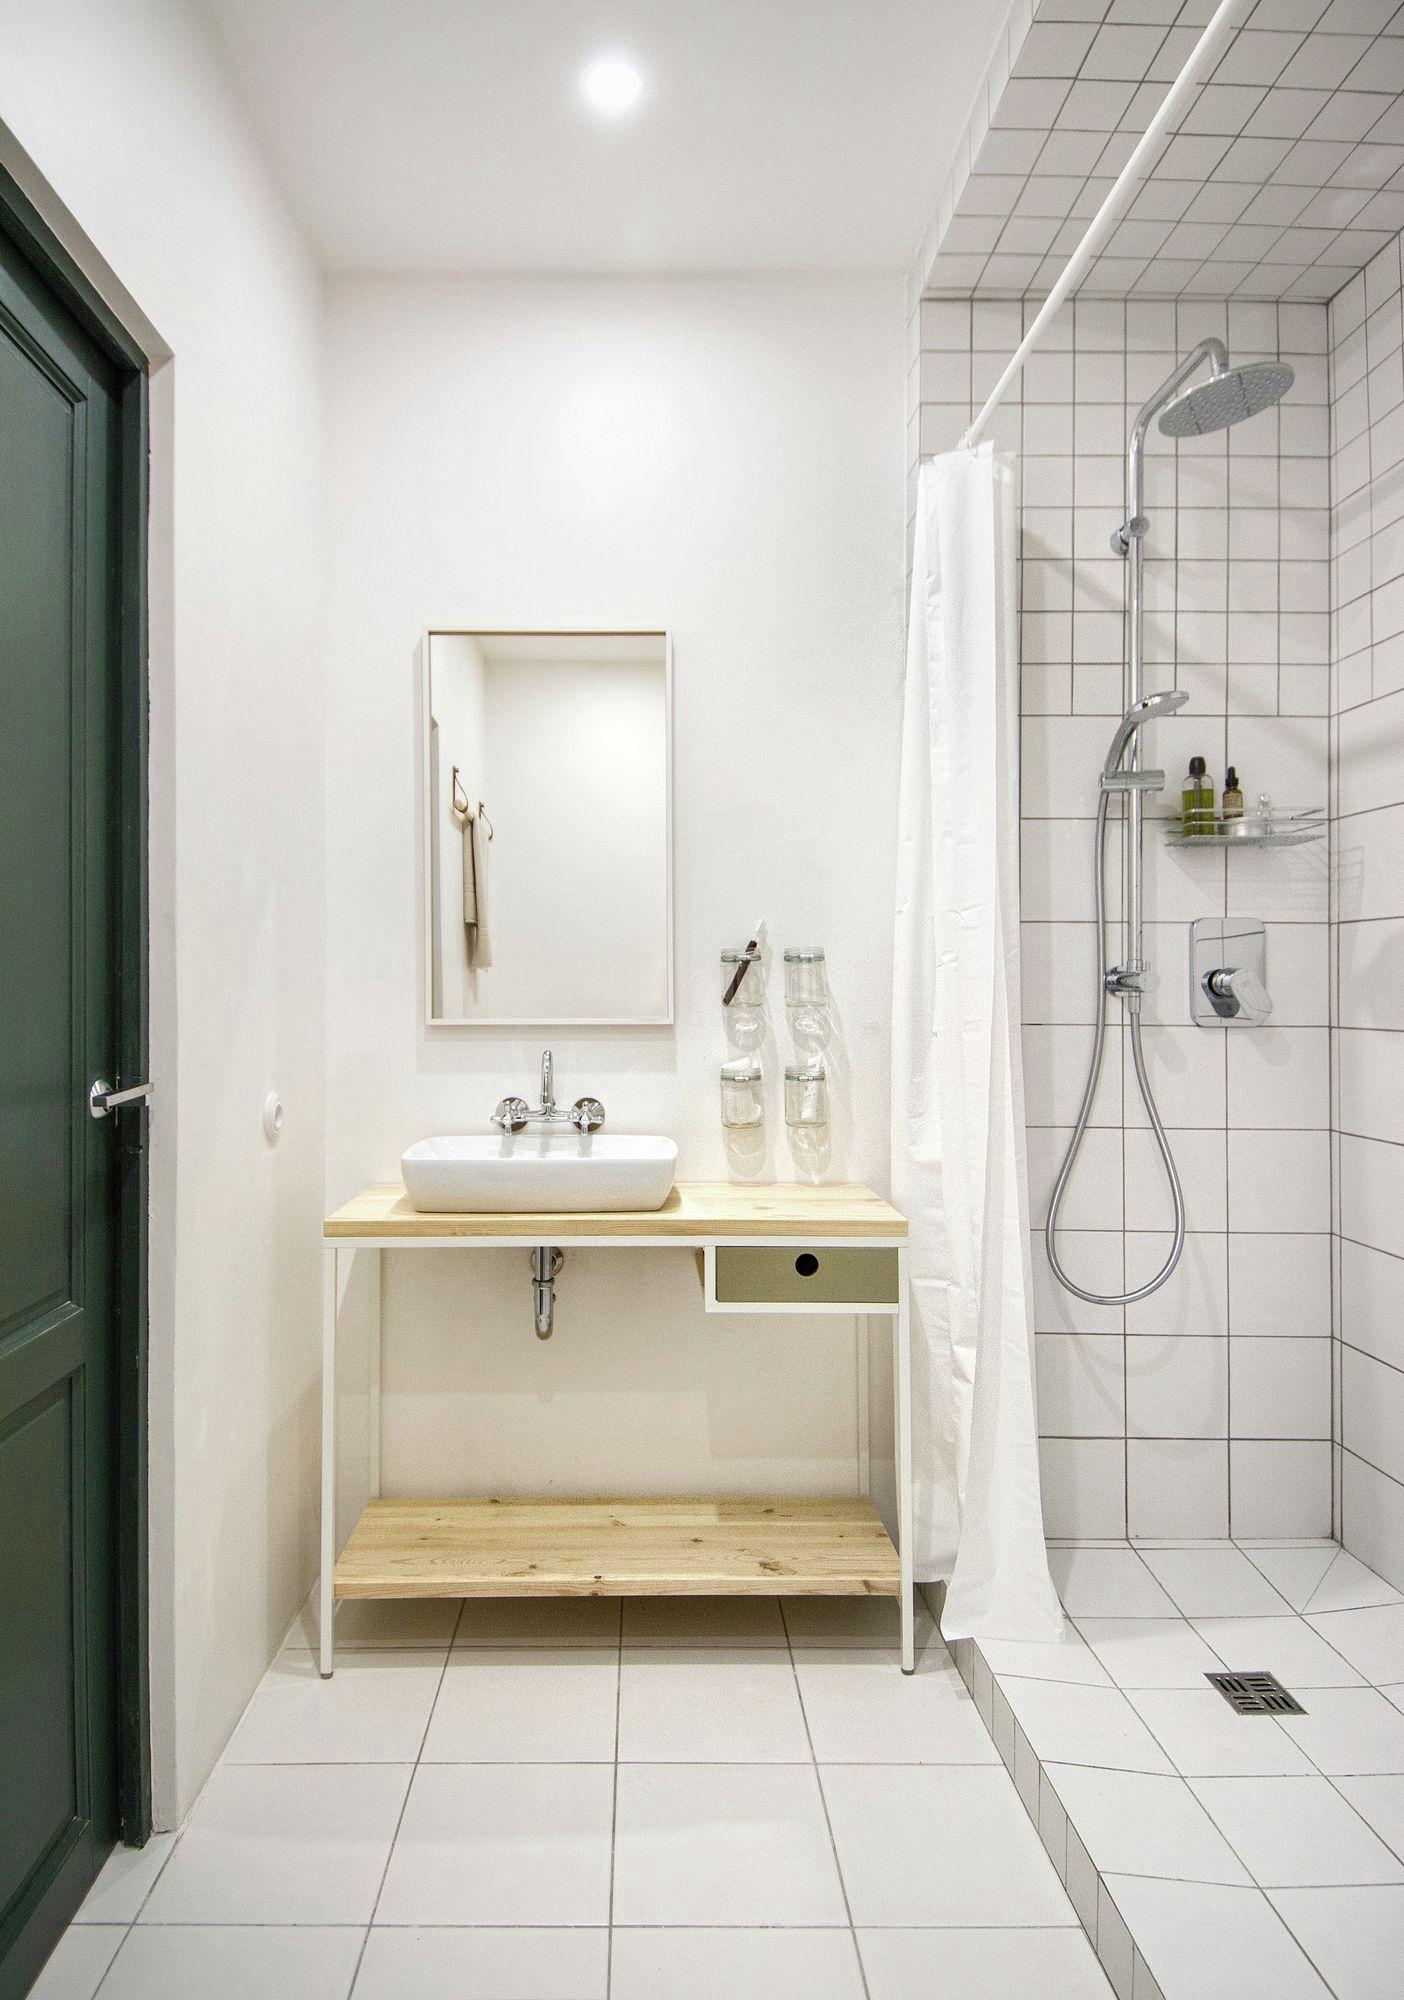 eclectic apartment in St. Petersburg bathroom sink vanity